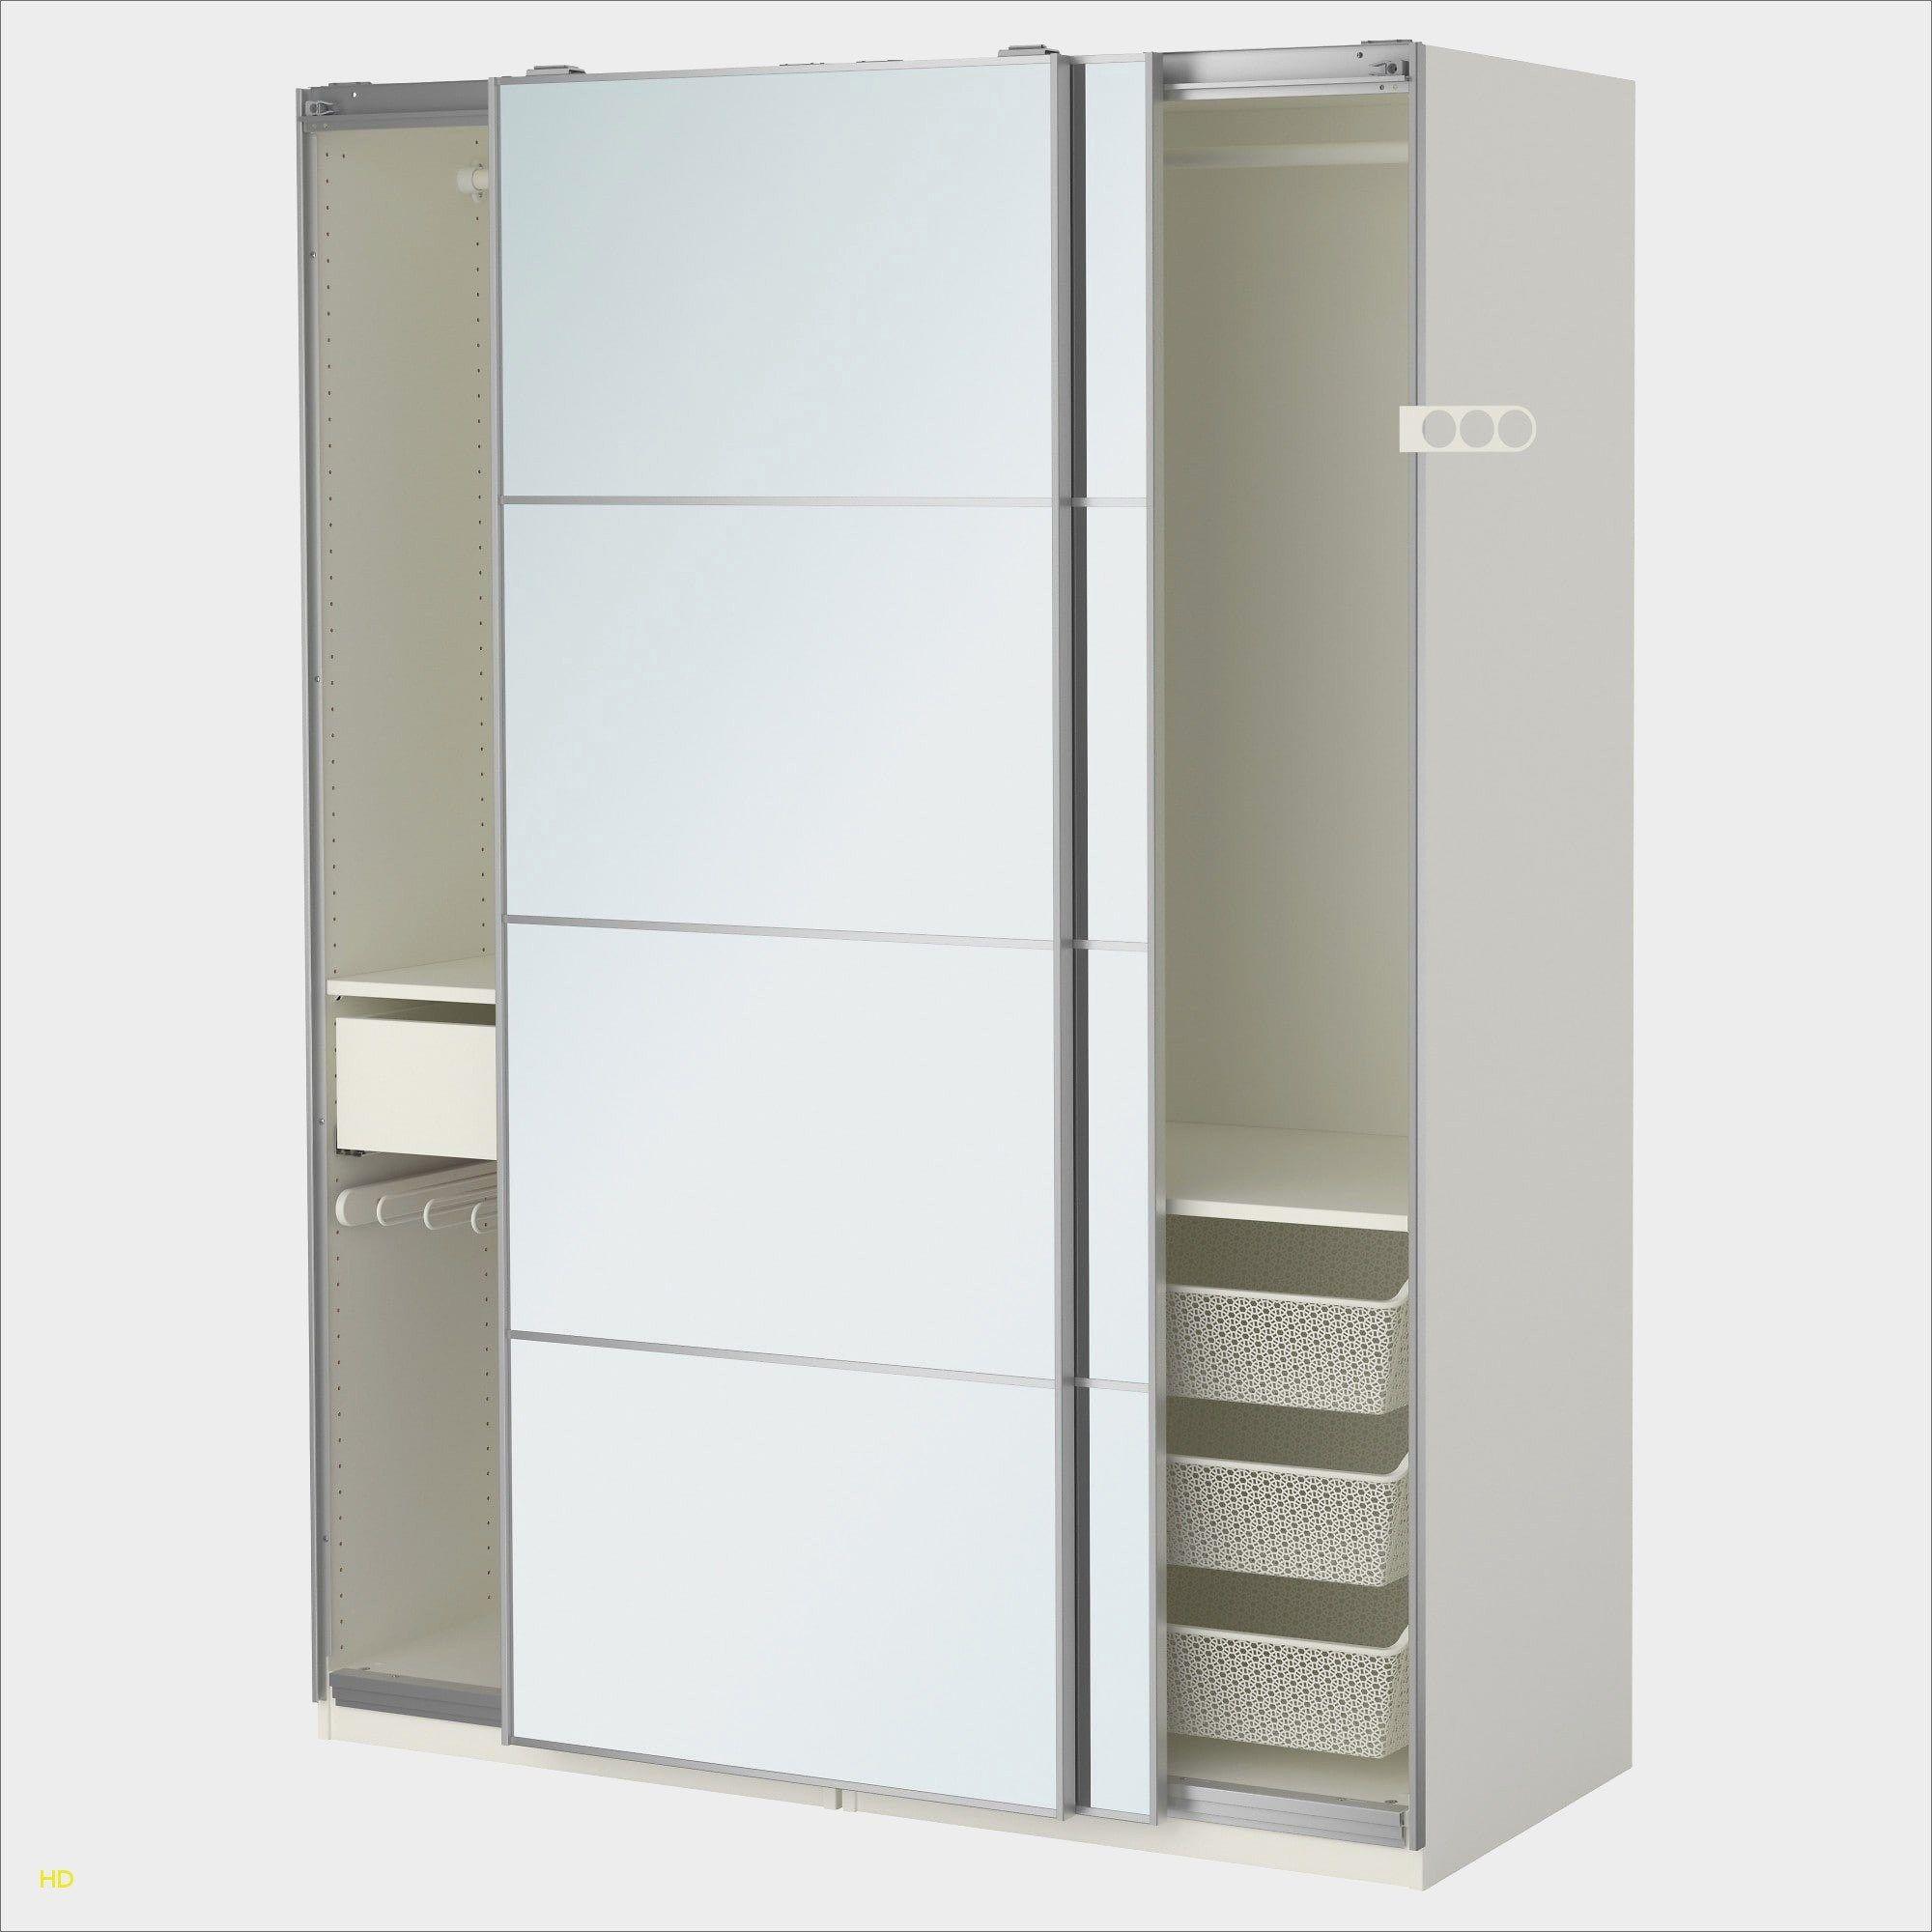 Fresh Casier Vestiaire Ikea | Armoire penderie, Armoire et Armoire dressing